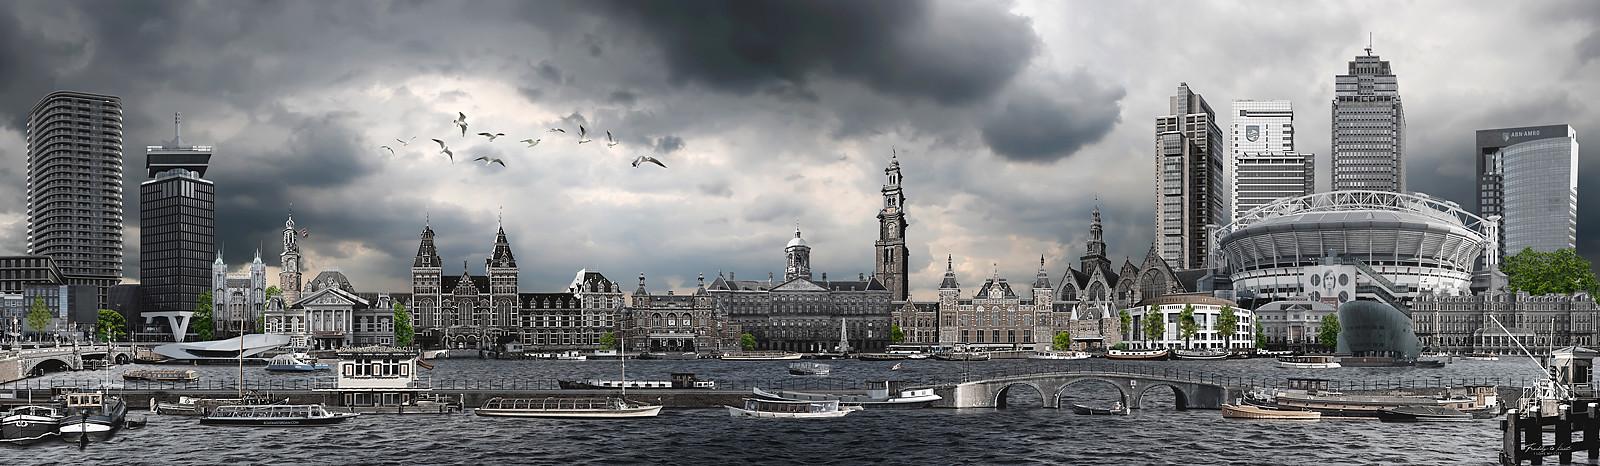 Skyline Amsterdam urban